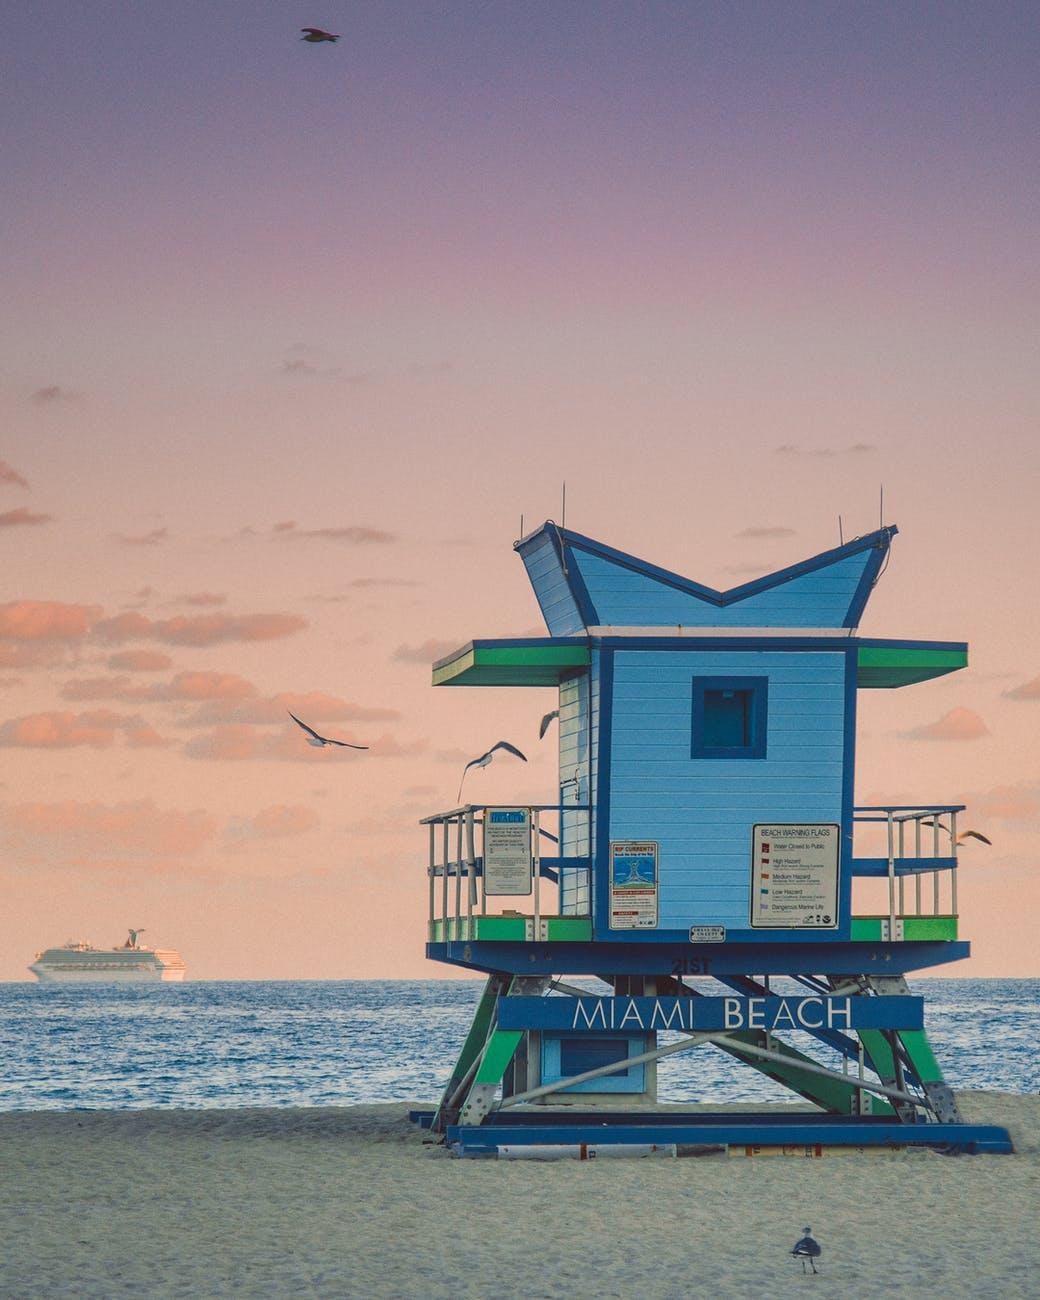 lifeguard building on seashore against sundown sky